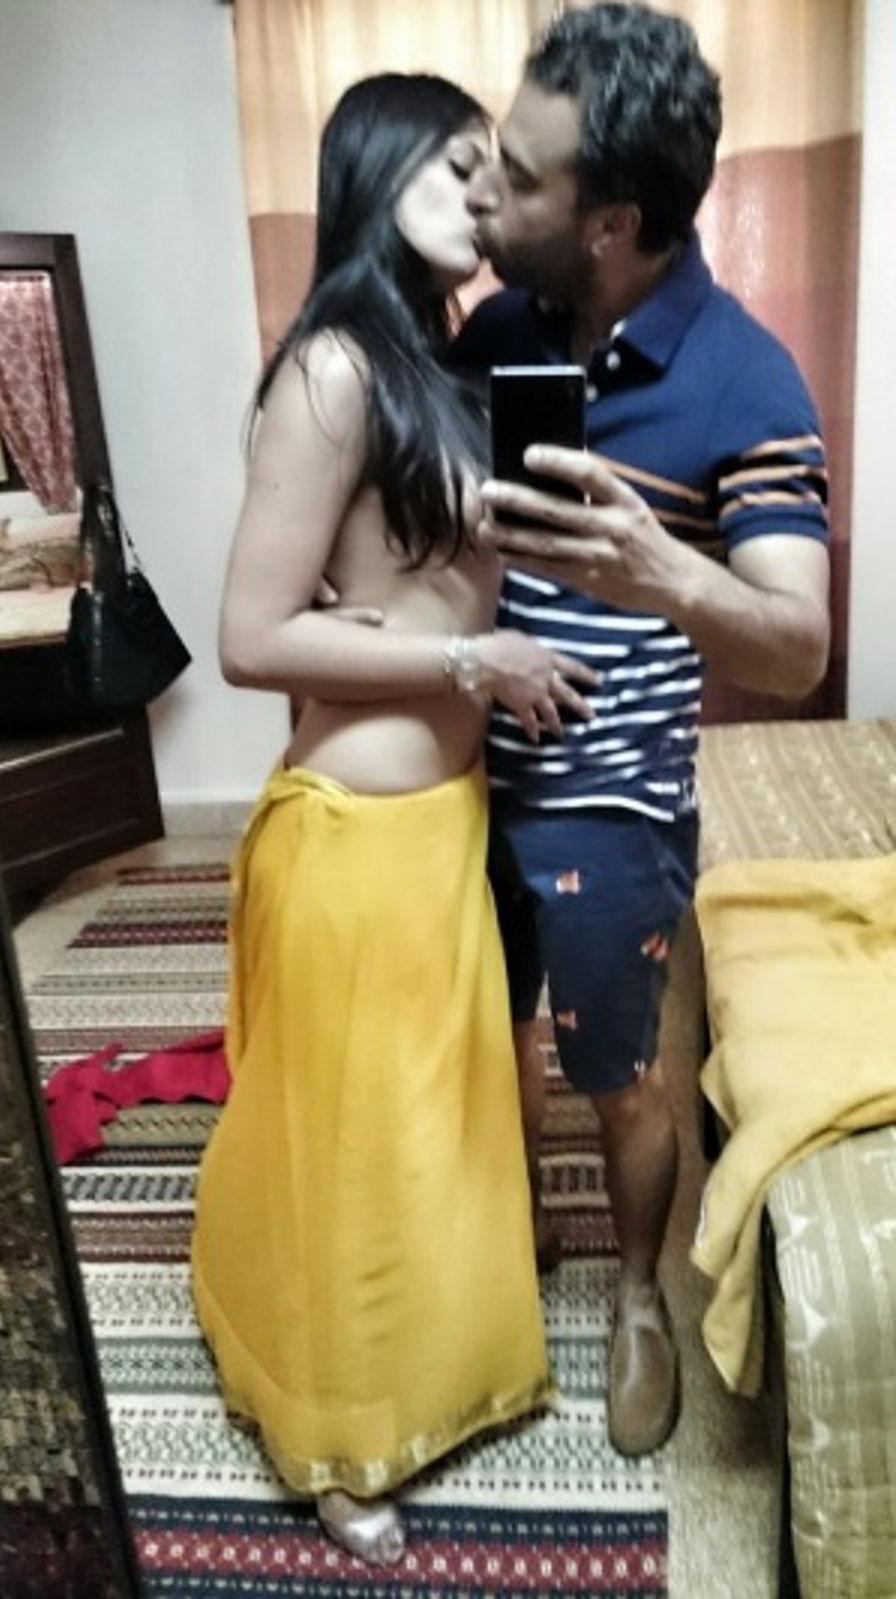 Indian Desi Girl Sex Nude 12 - Juicy Indian Desi Girl Hardcore Sex Nude Undressed